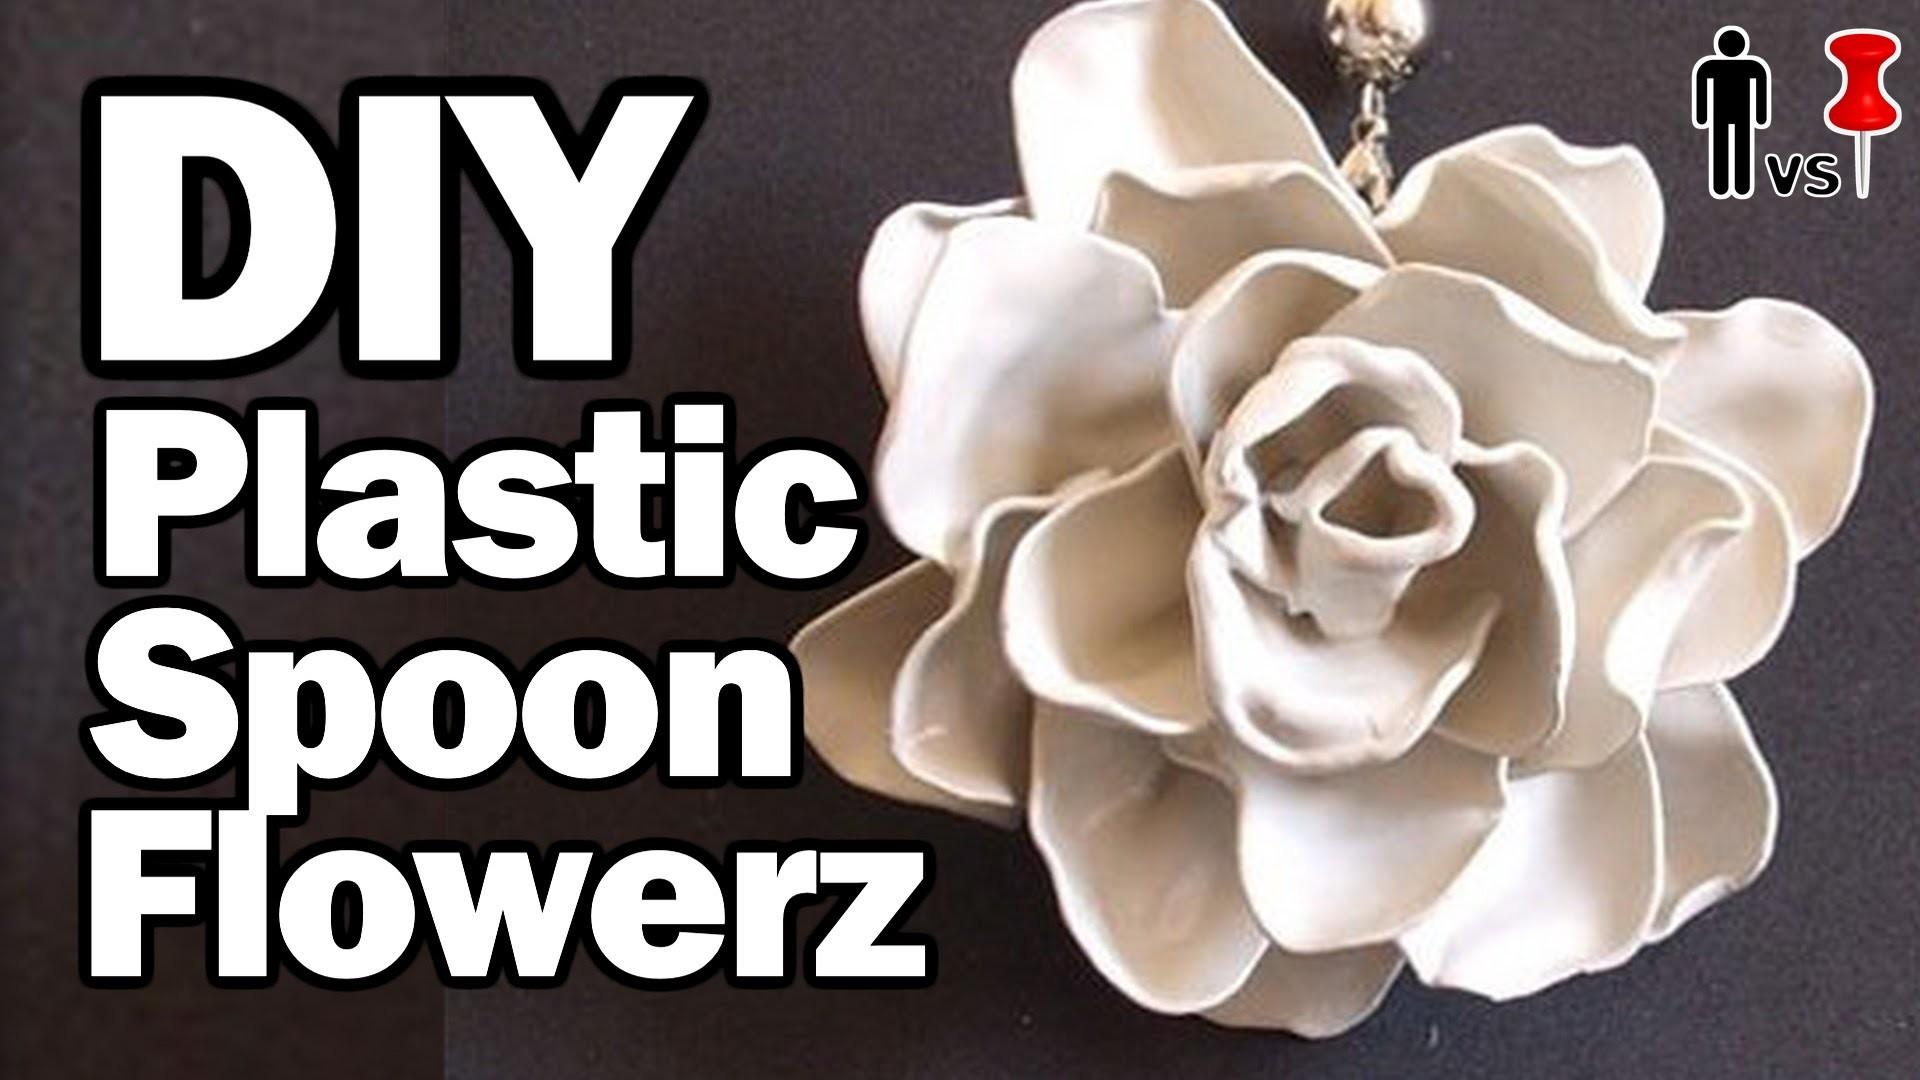 DIY Plastic Spoon Flowers - Man Vs. Pin #38